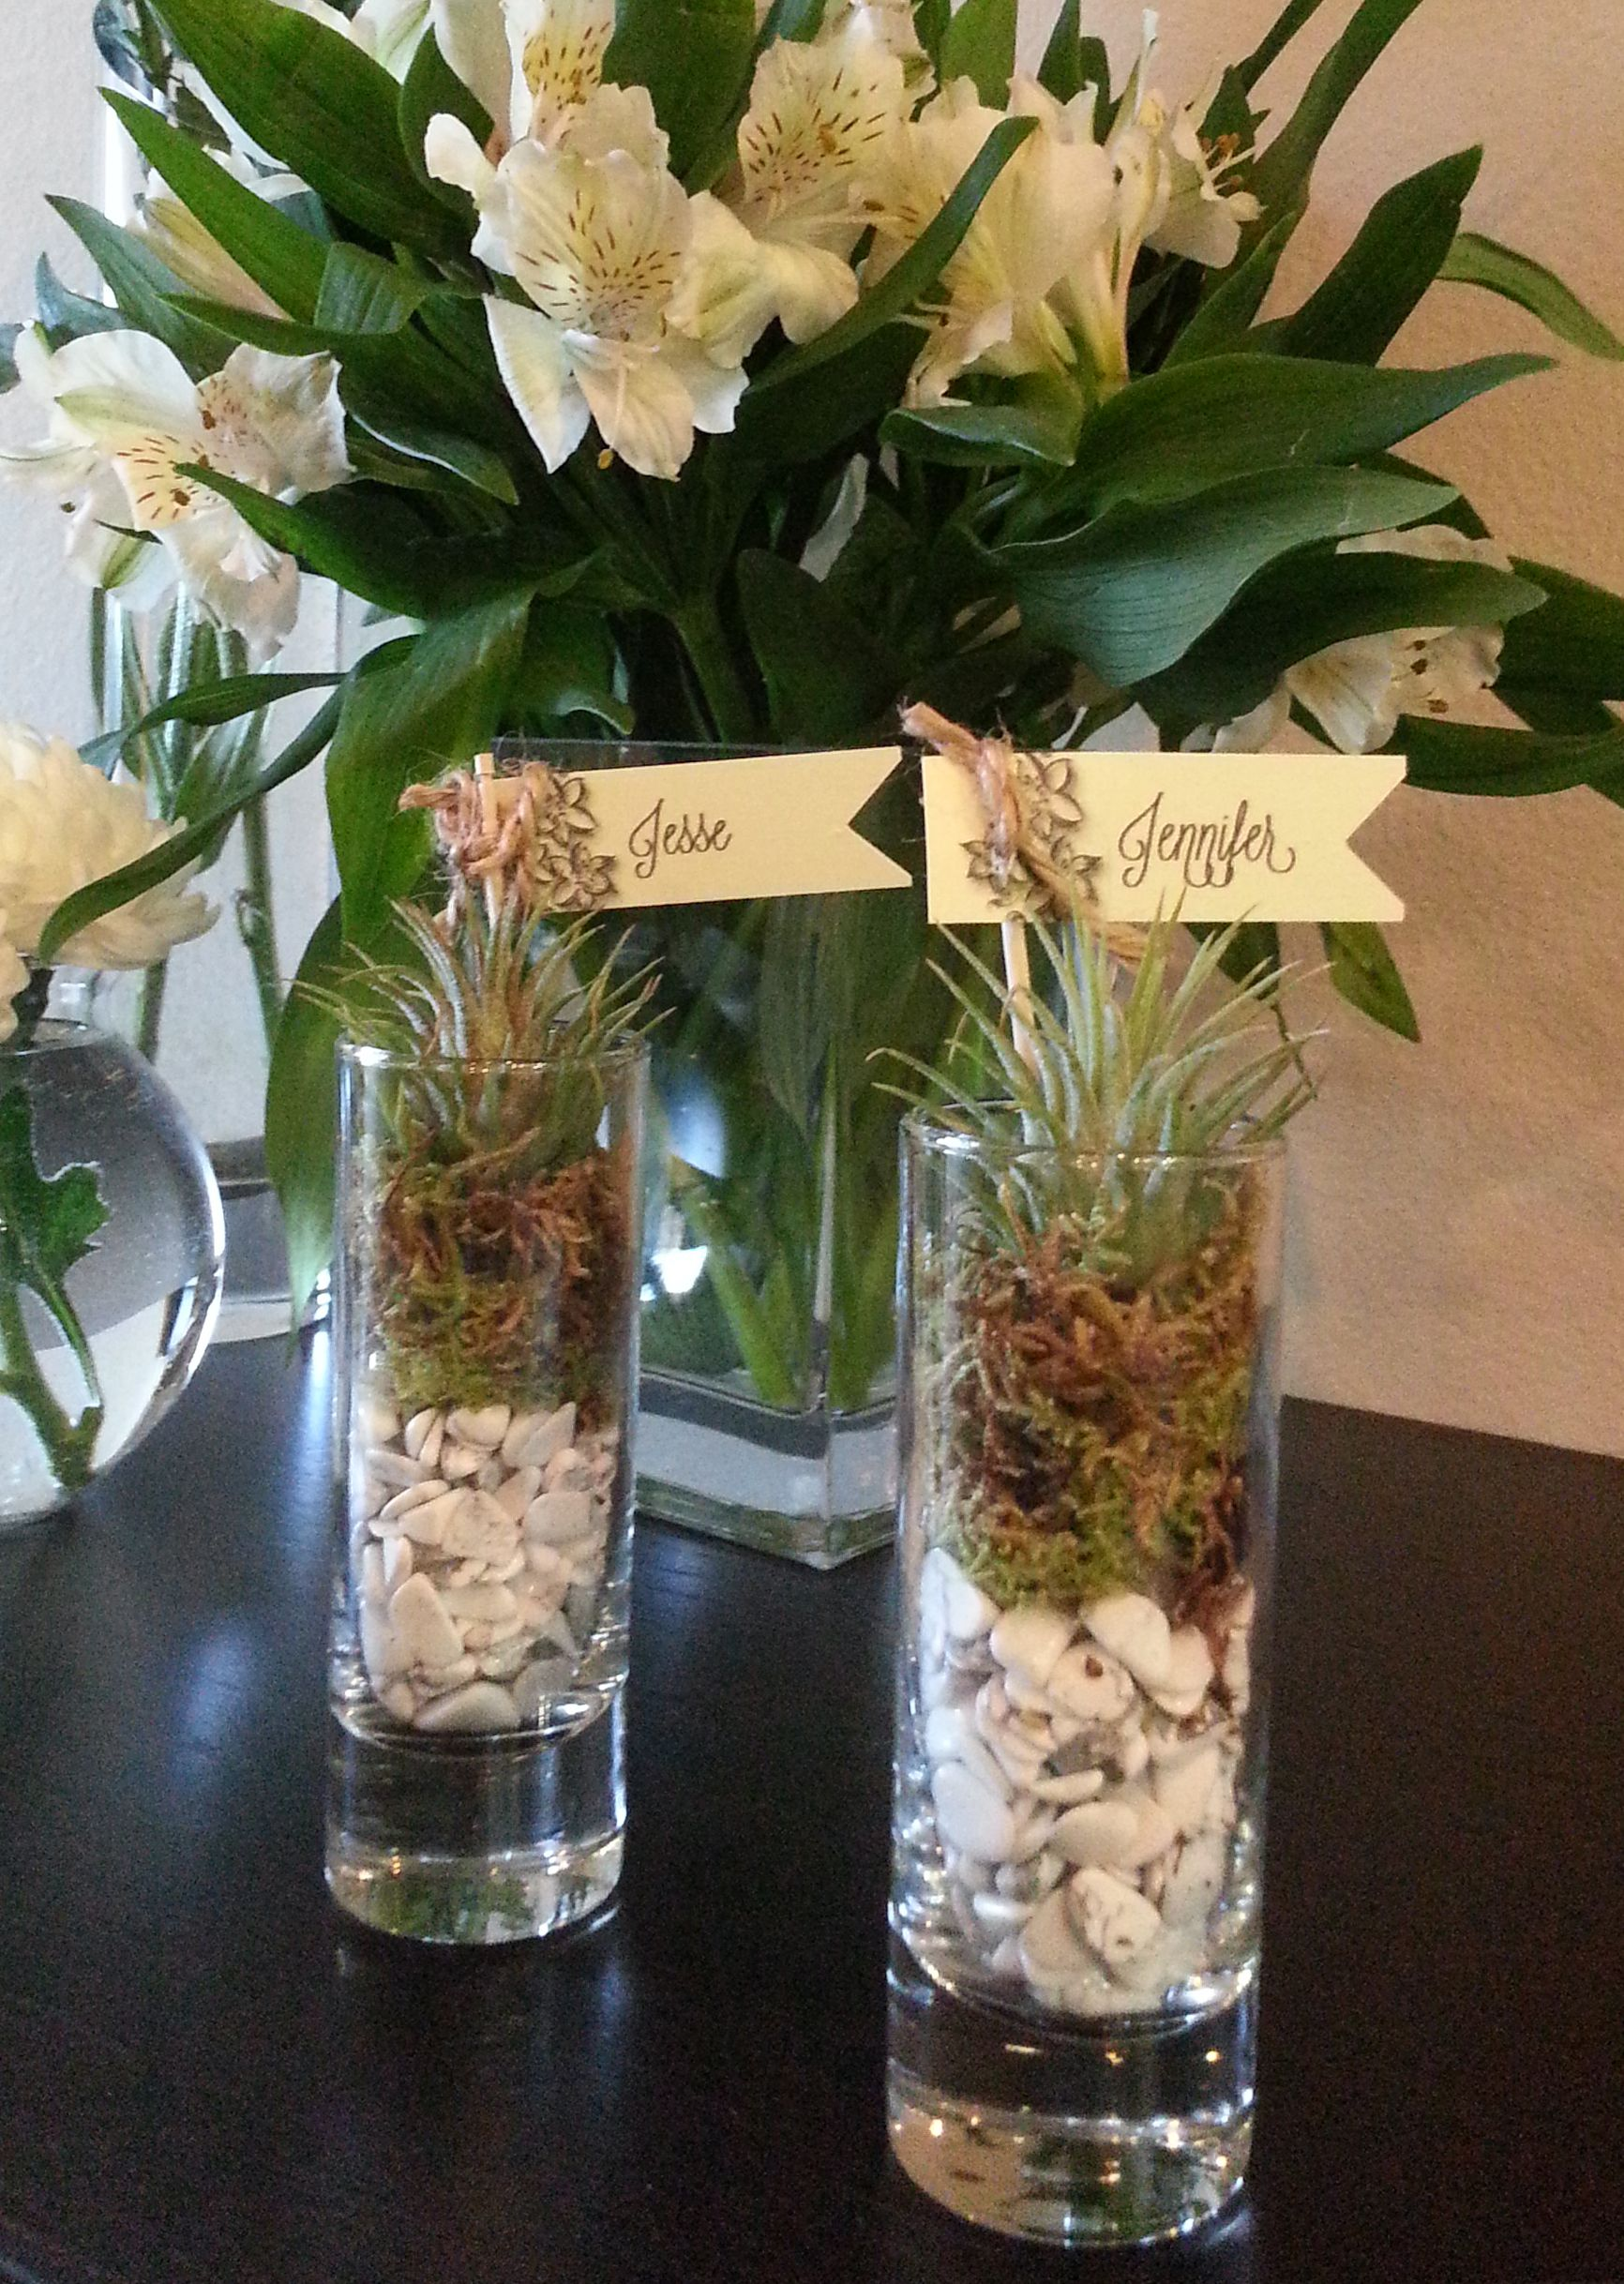 Favor place card mini air plants in shot glasses diy favor place card mini air plants in shot glasses diy reviewsmspy